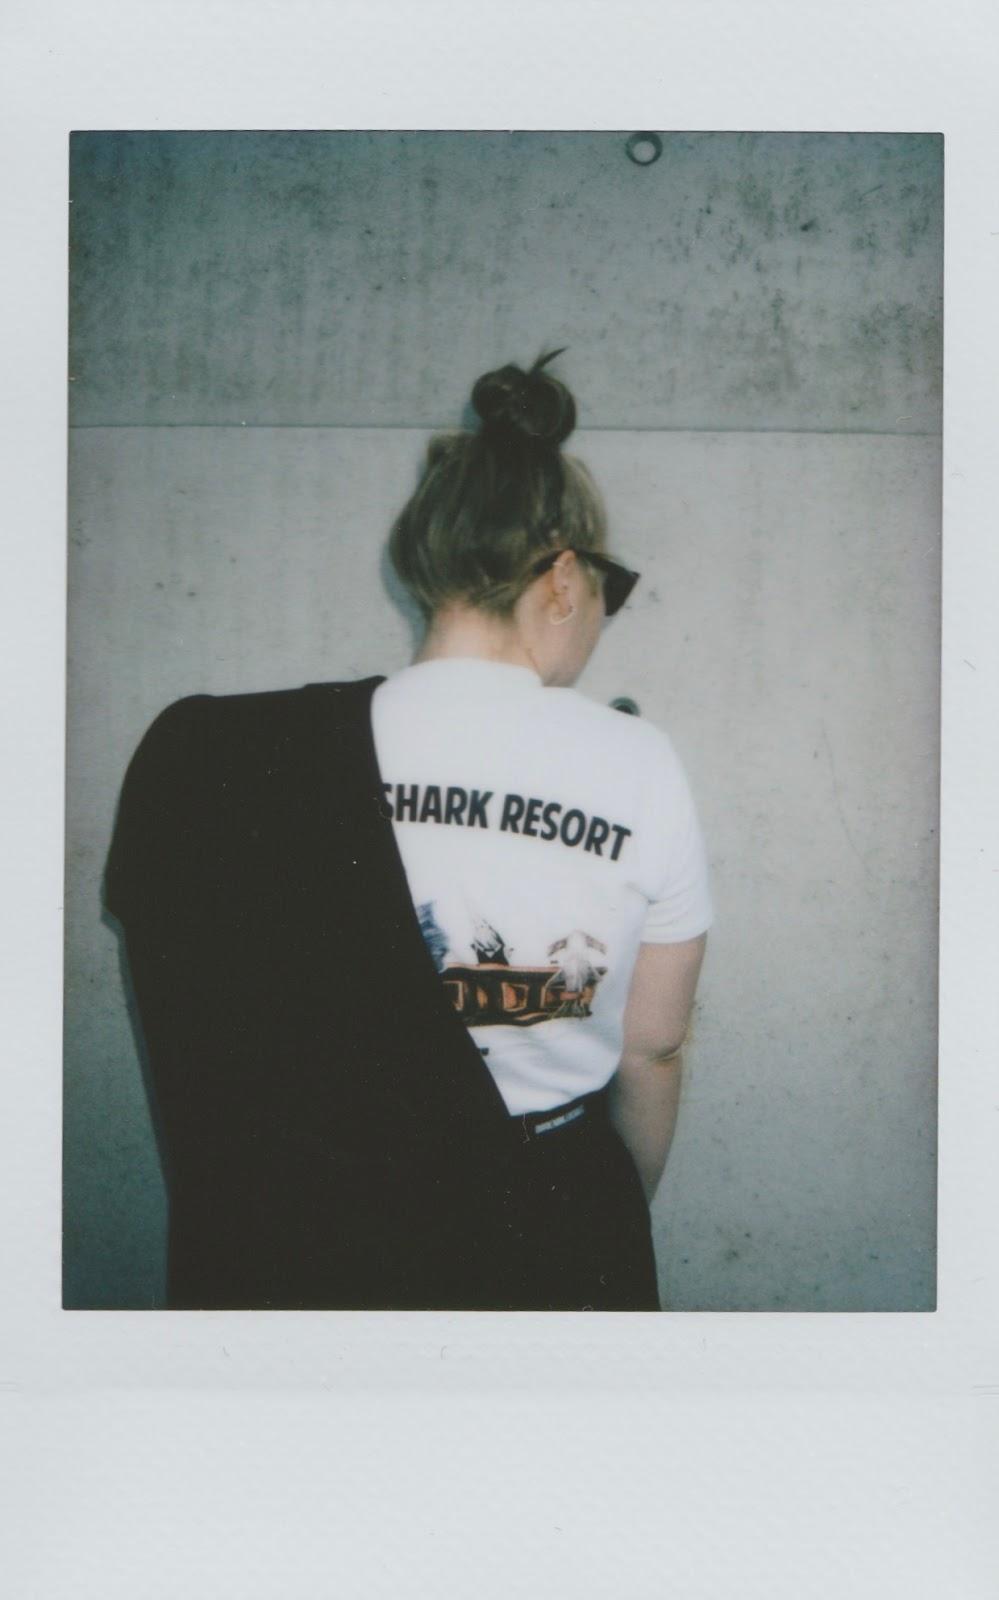 Outfit: Shark Resort